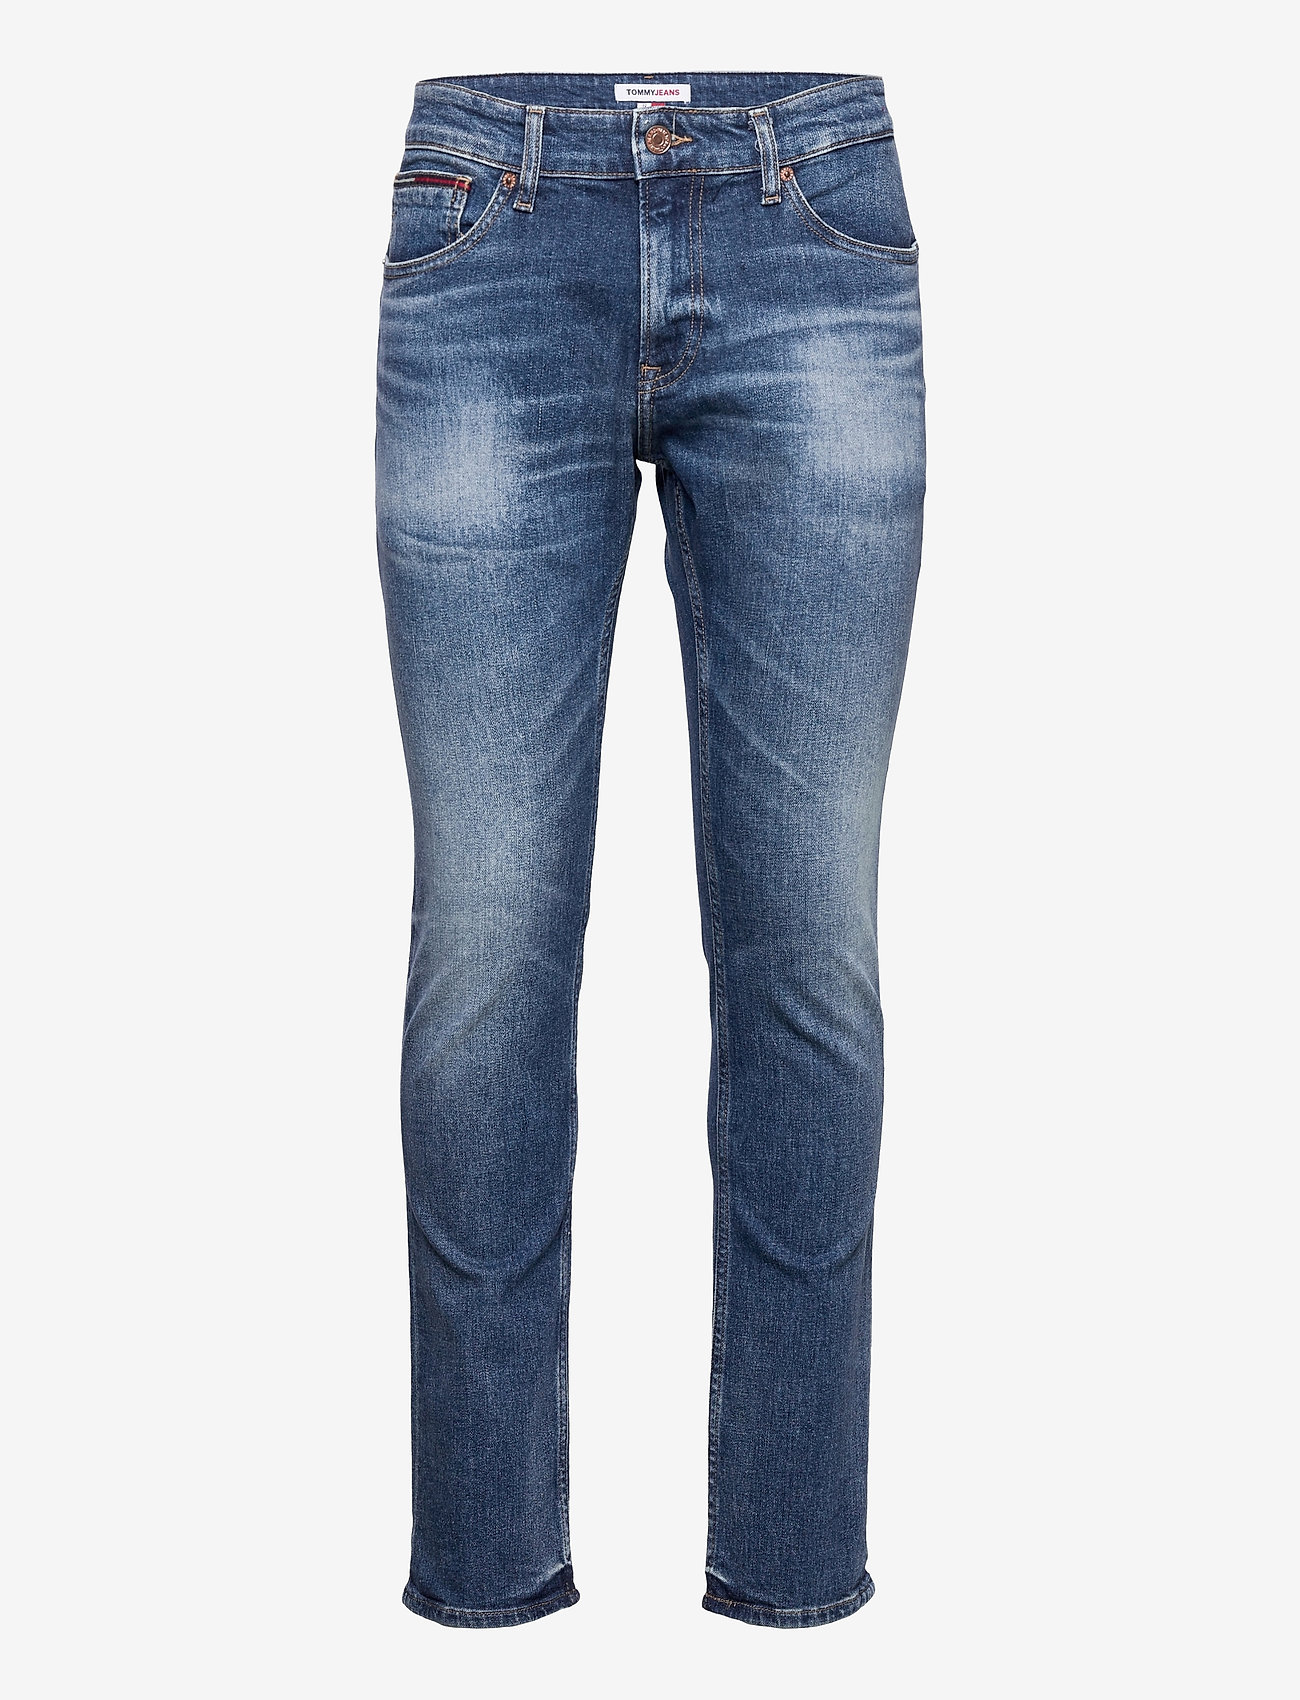 Tommy Jeans - SCANTON SLIM DSYC - slim jeans - dean six years com - 0